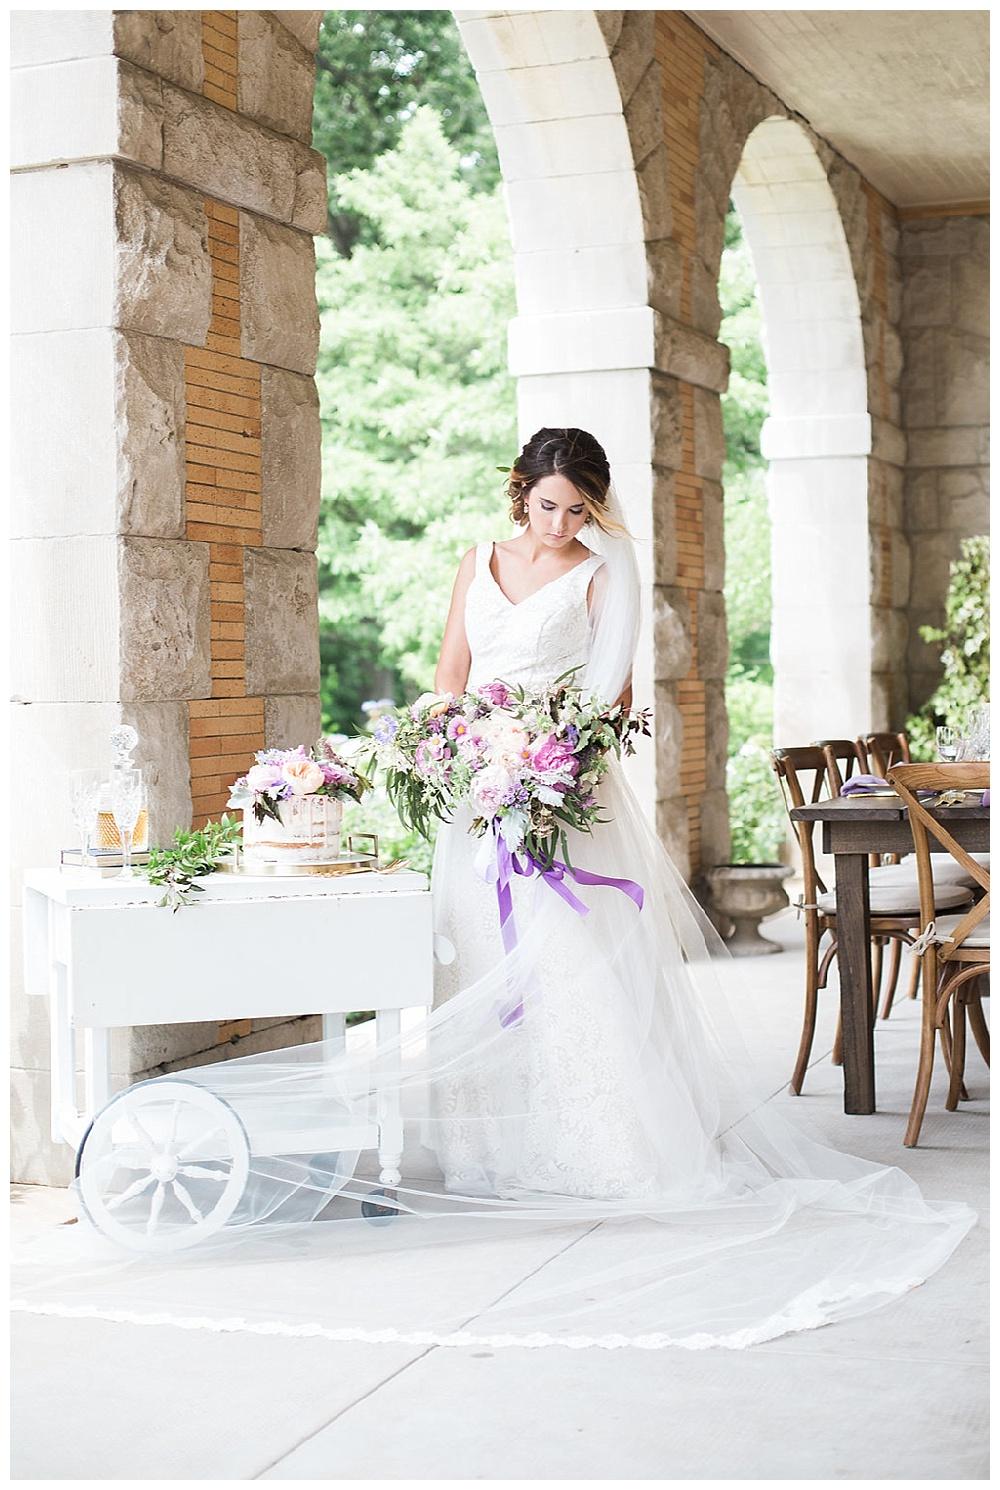 Carinwood Estate Wedding Inspiration | Huntington Valley, PA | Philadelphia Weddings | www.redoakweddings.com